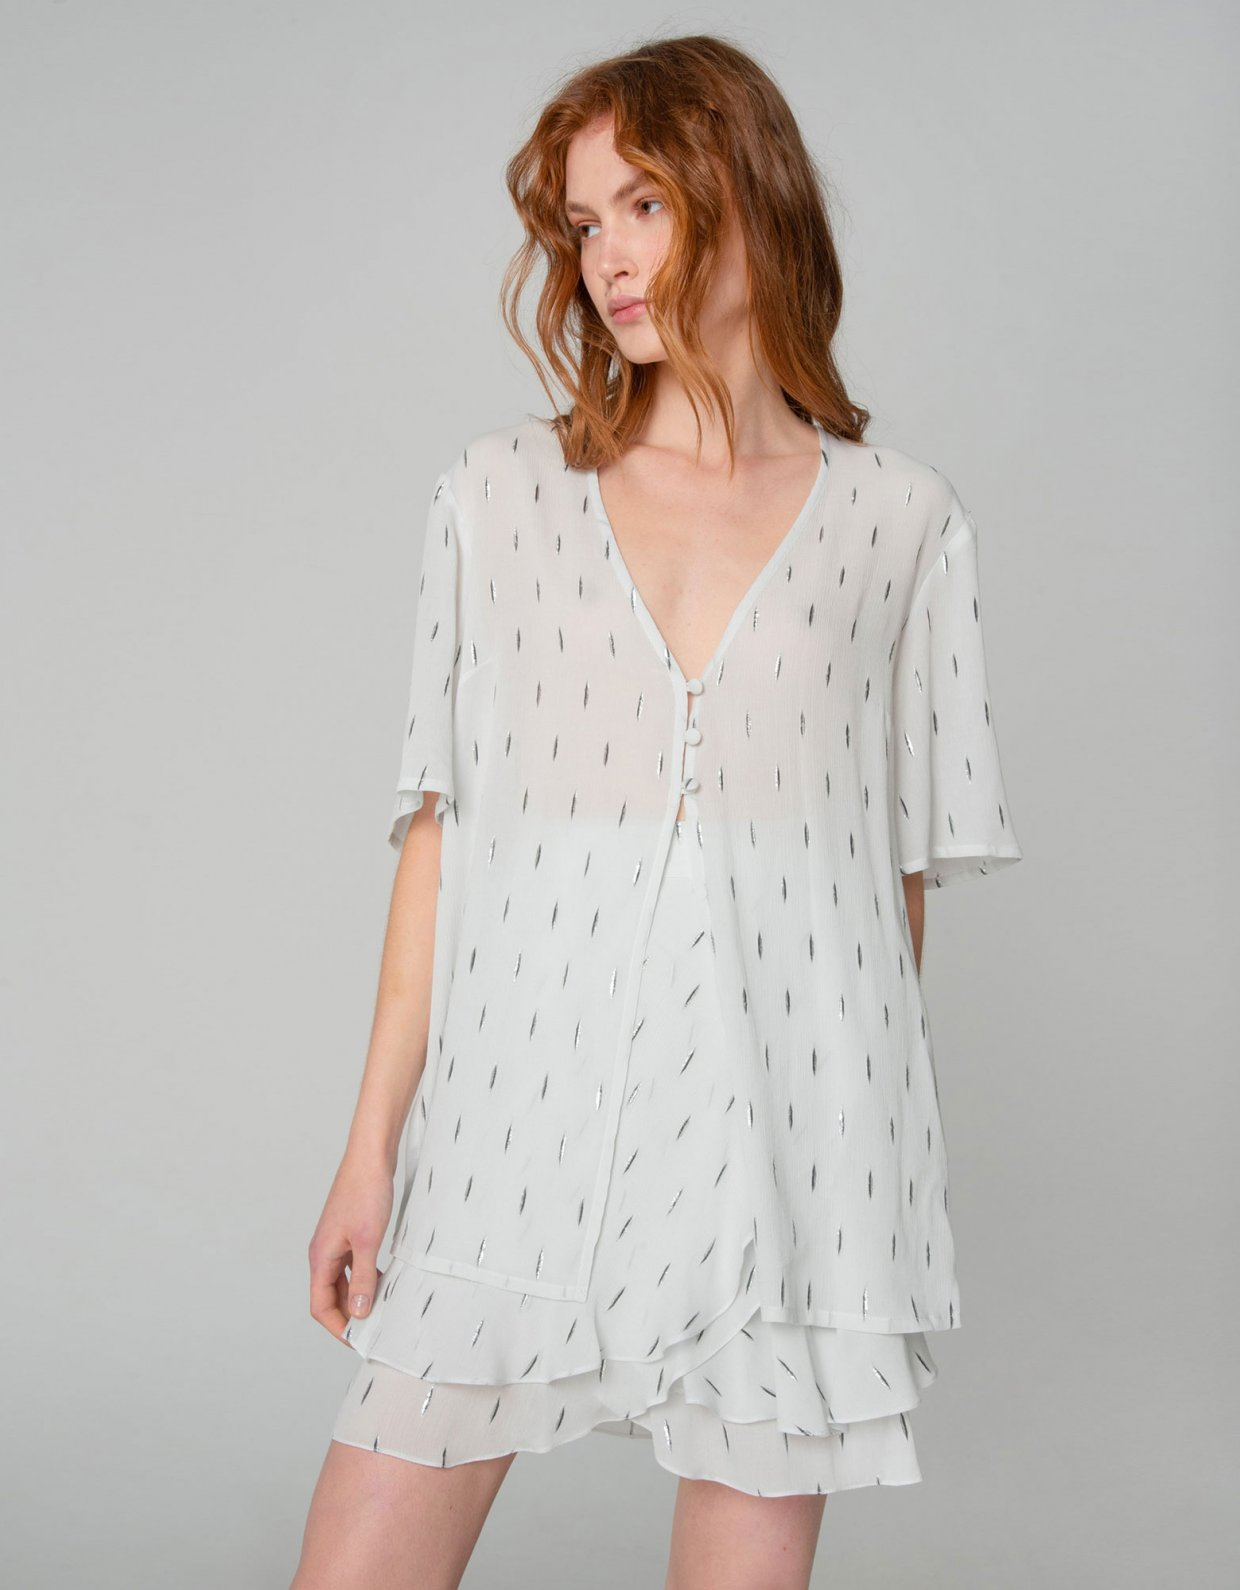 Nadia Rapti Pearl of Africa shirt white